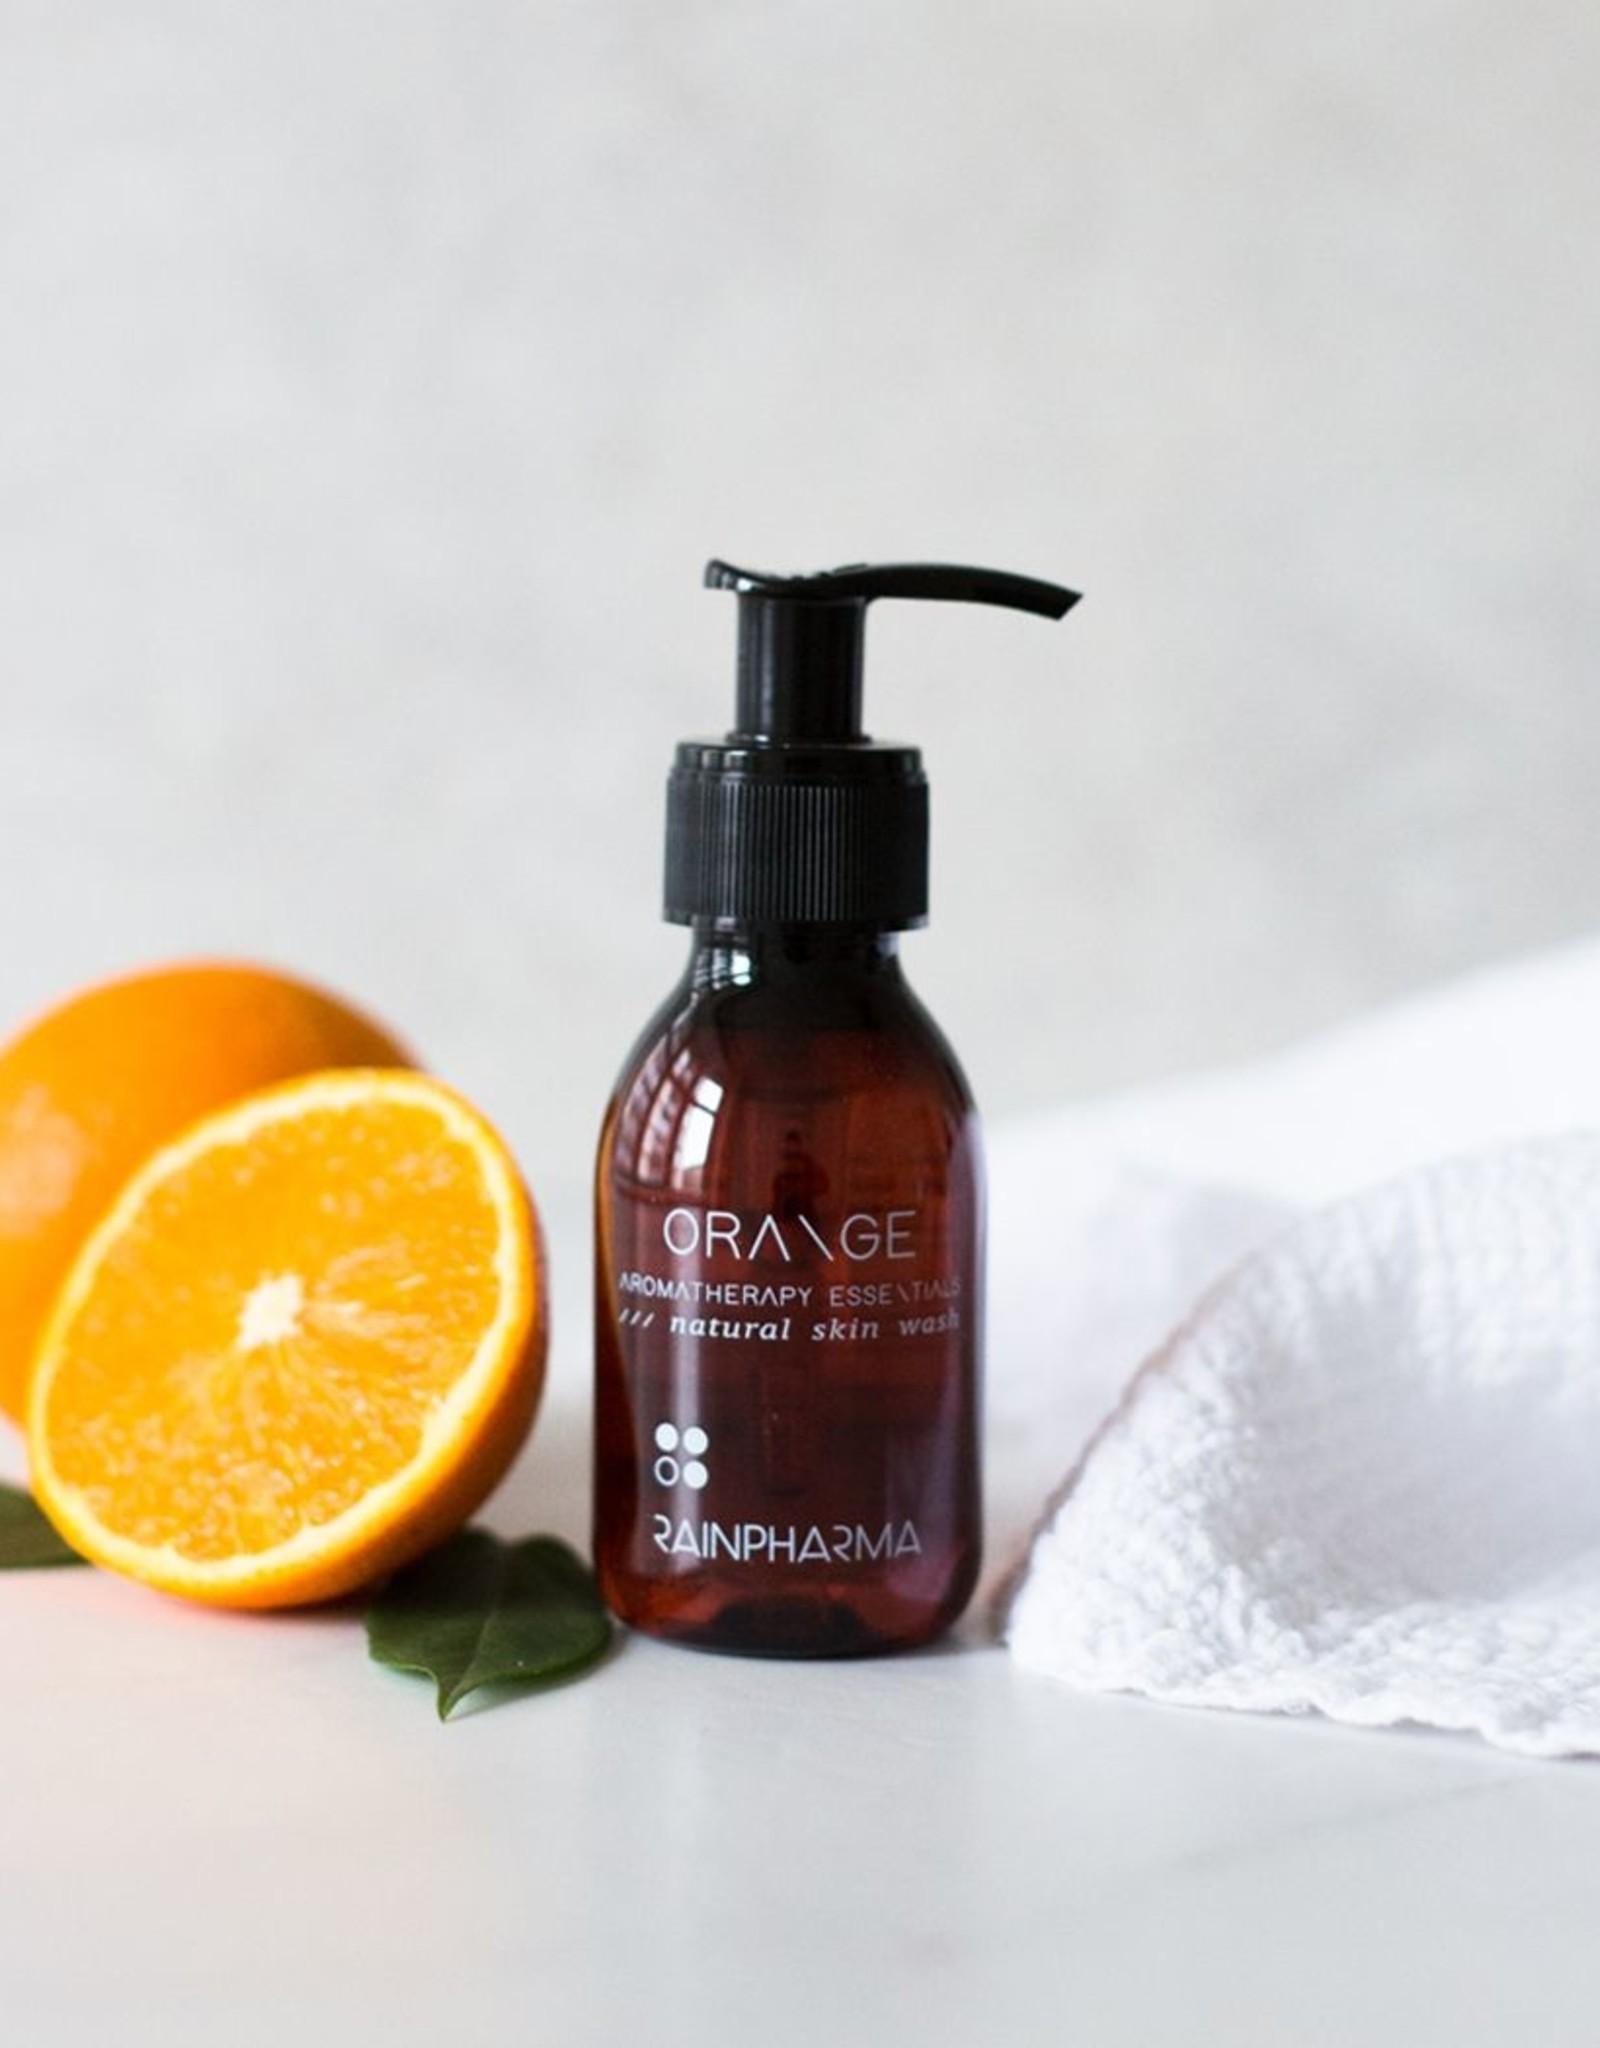 RainPharma Skin Wash Orange 100ml - Rainpharma